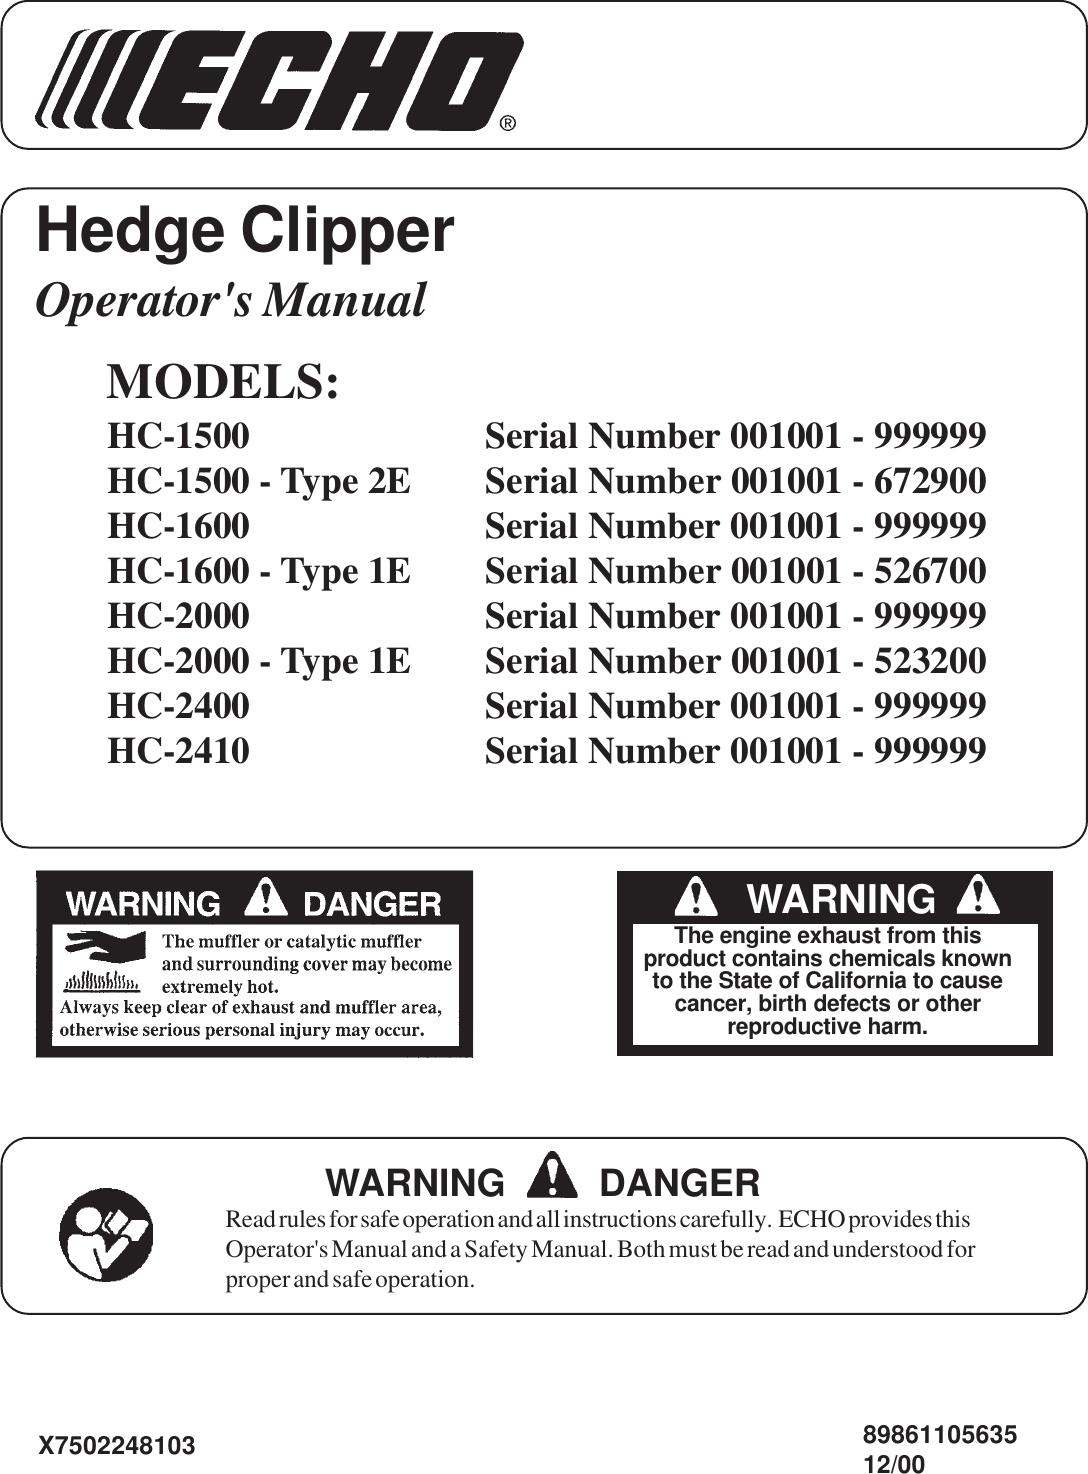 Echo Hc 2410 Users Manual Hces_122000